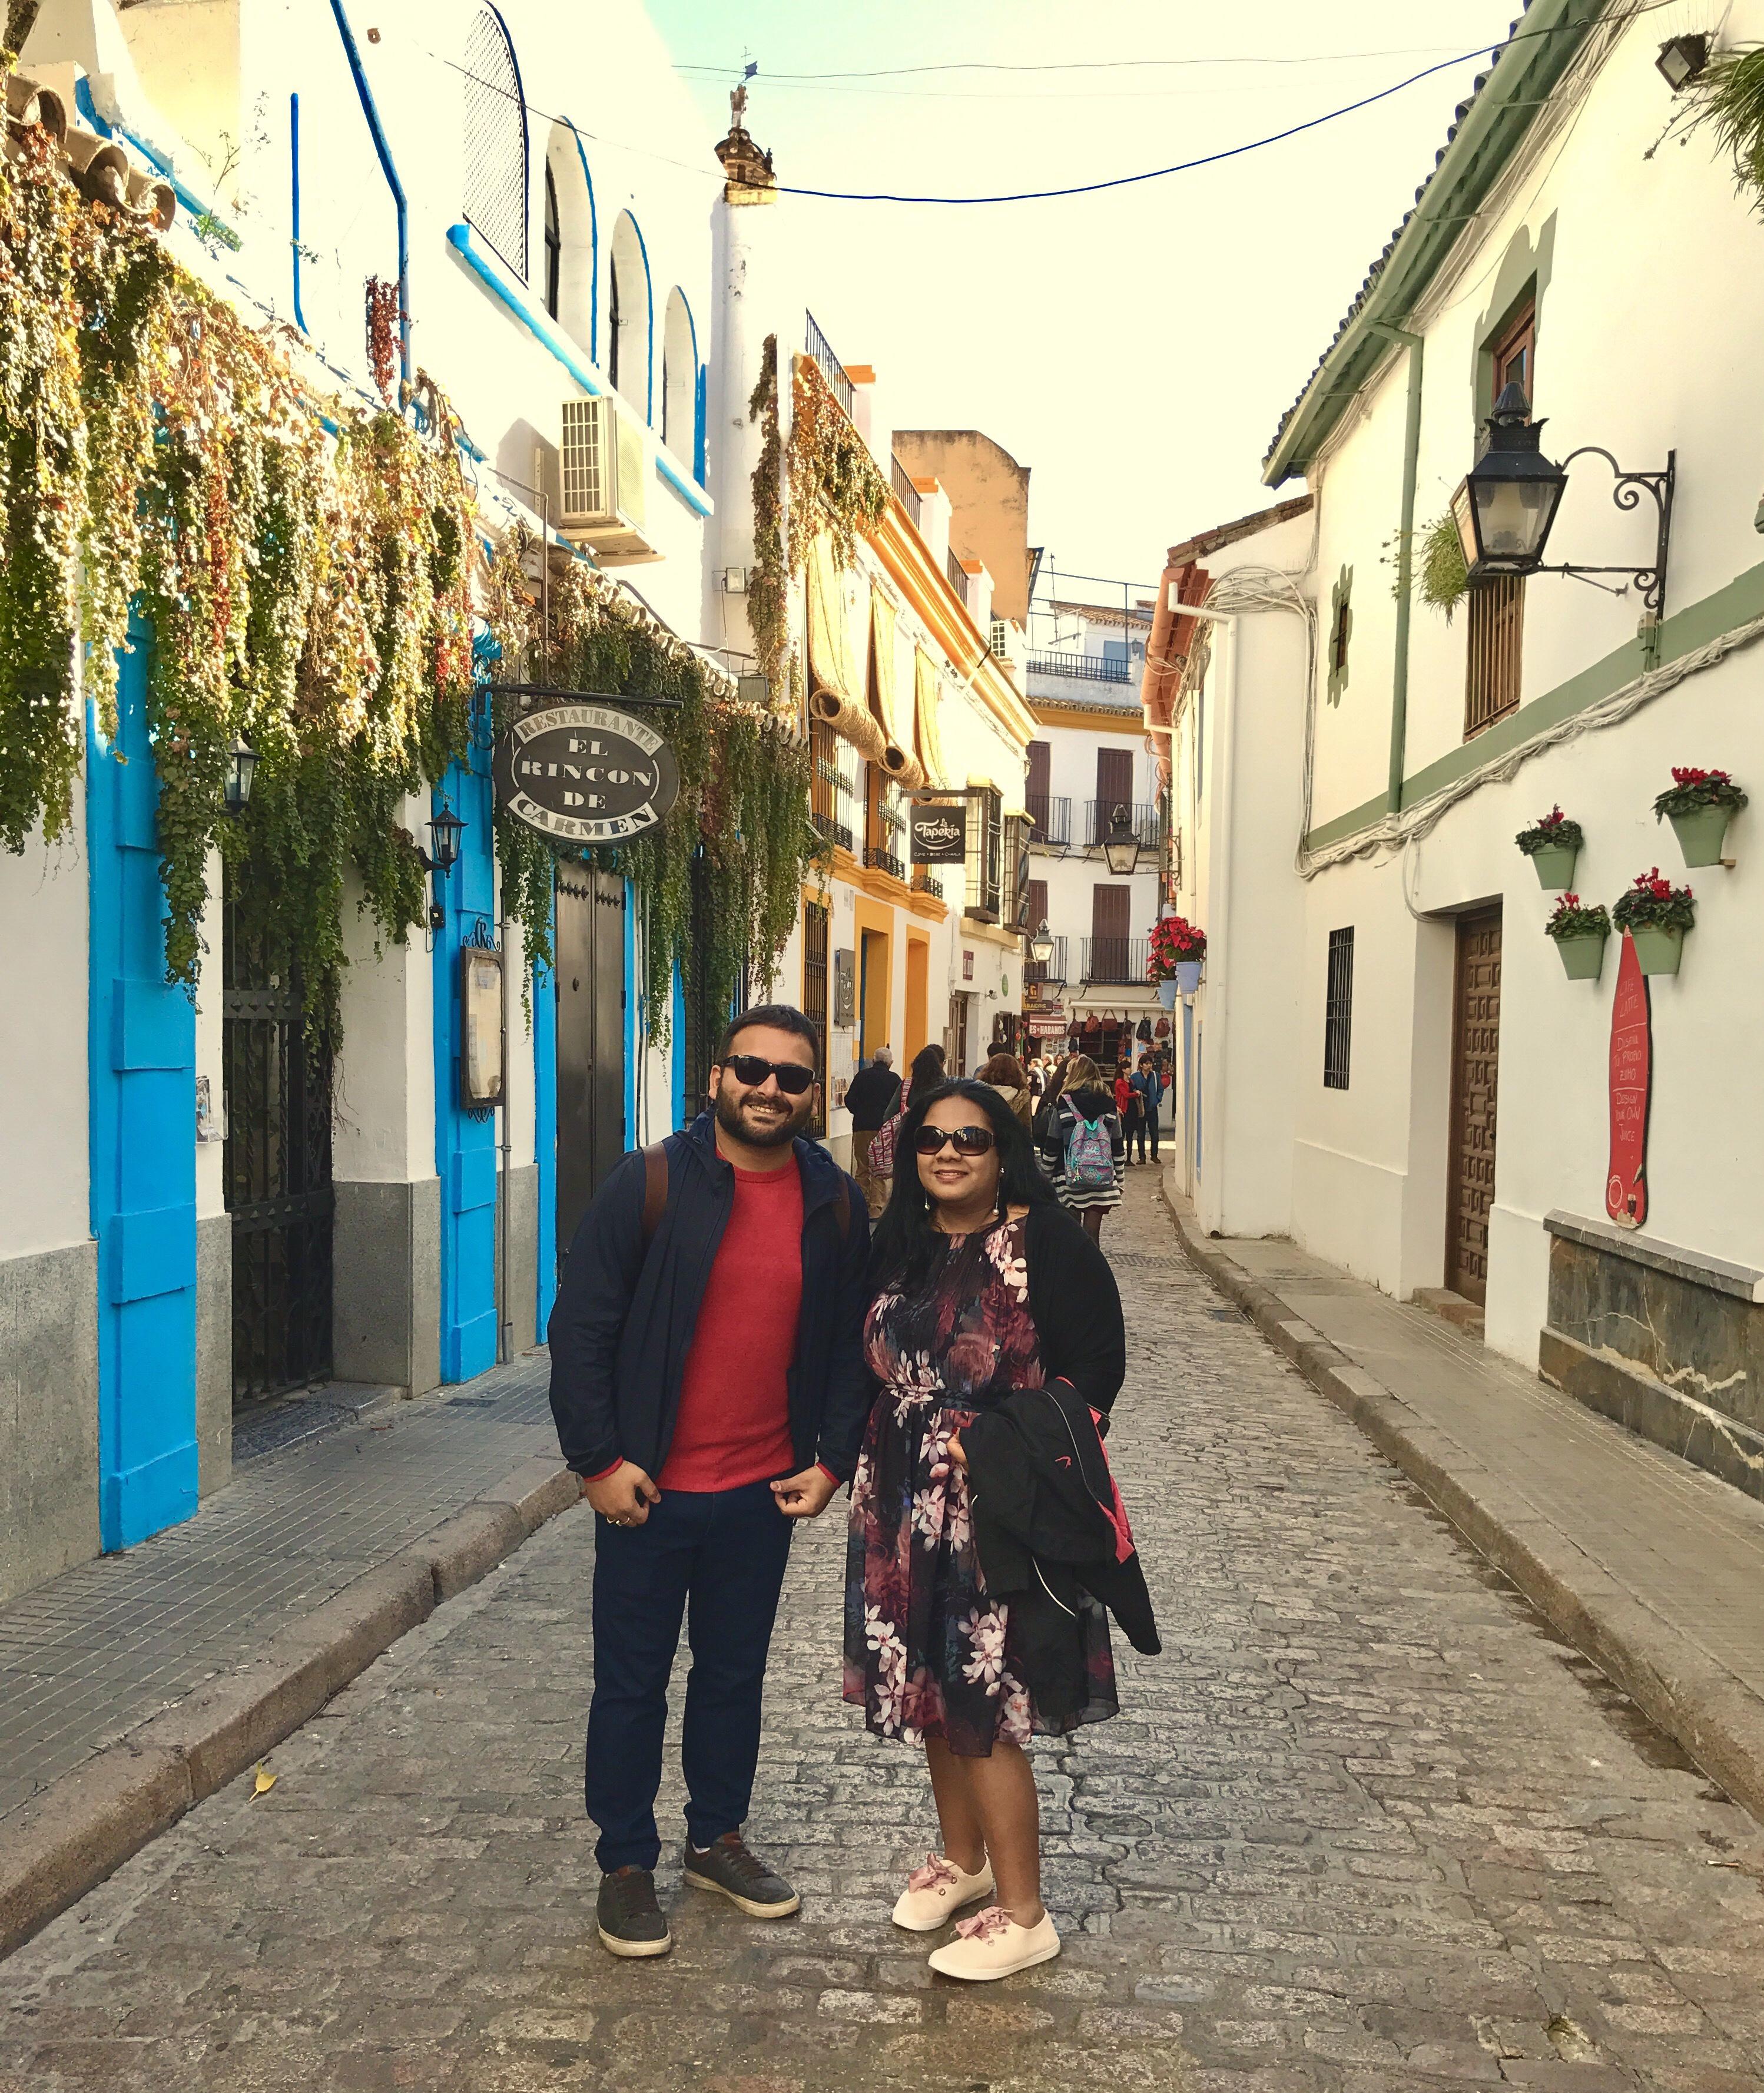 The beautiful streets of Cordoba.